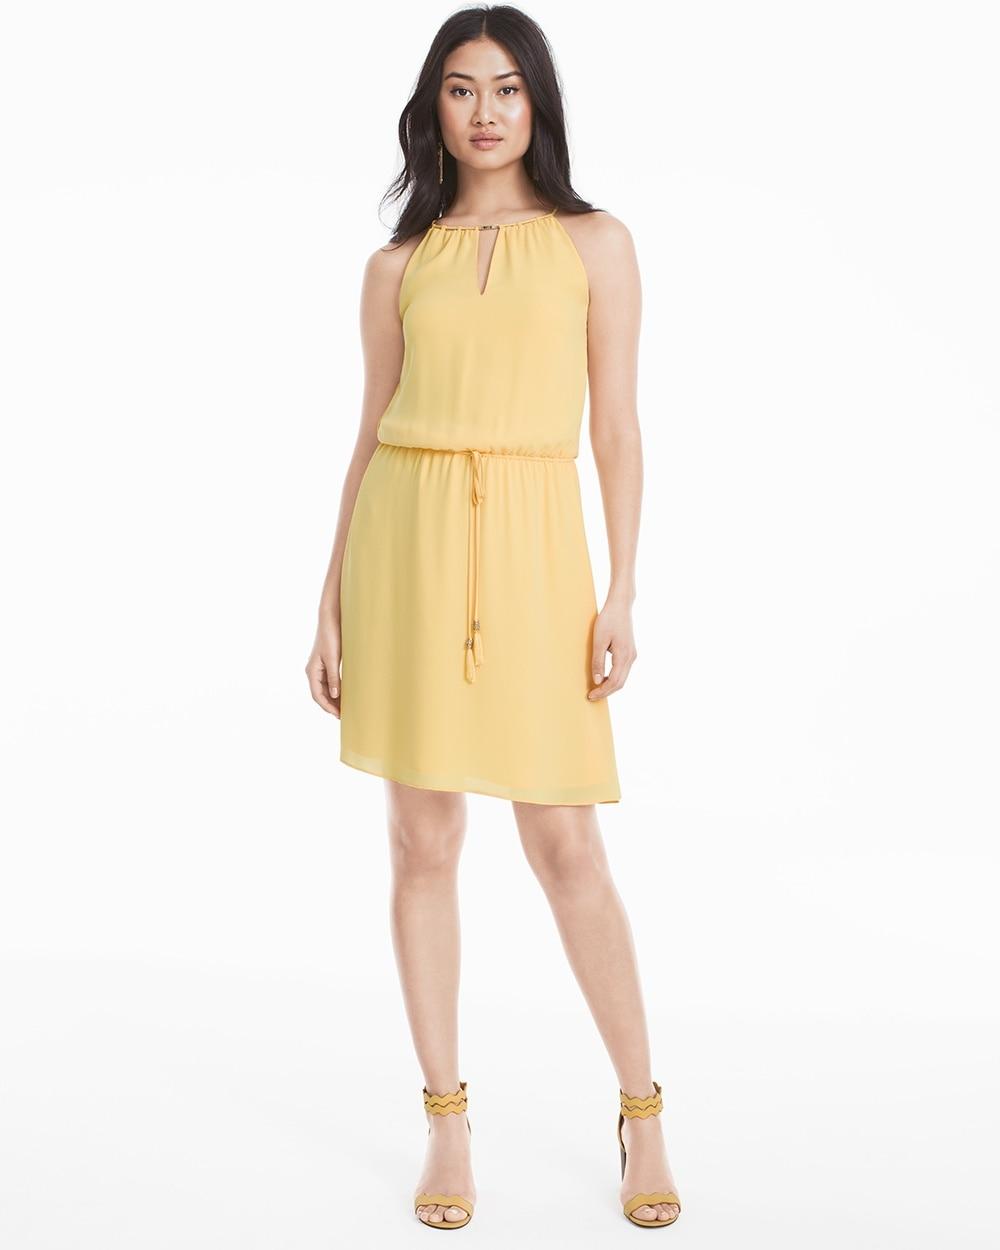 Sleeveless Tie Waist Yellow Blouson Dress White House Black Market